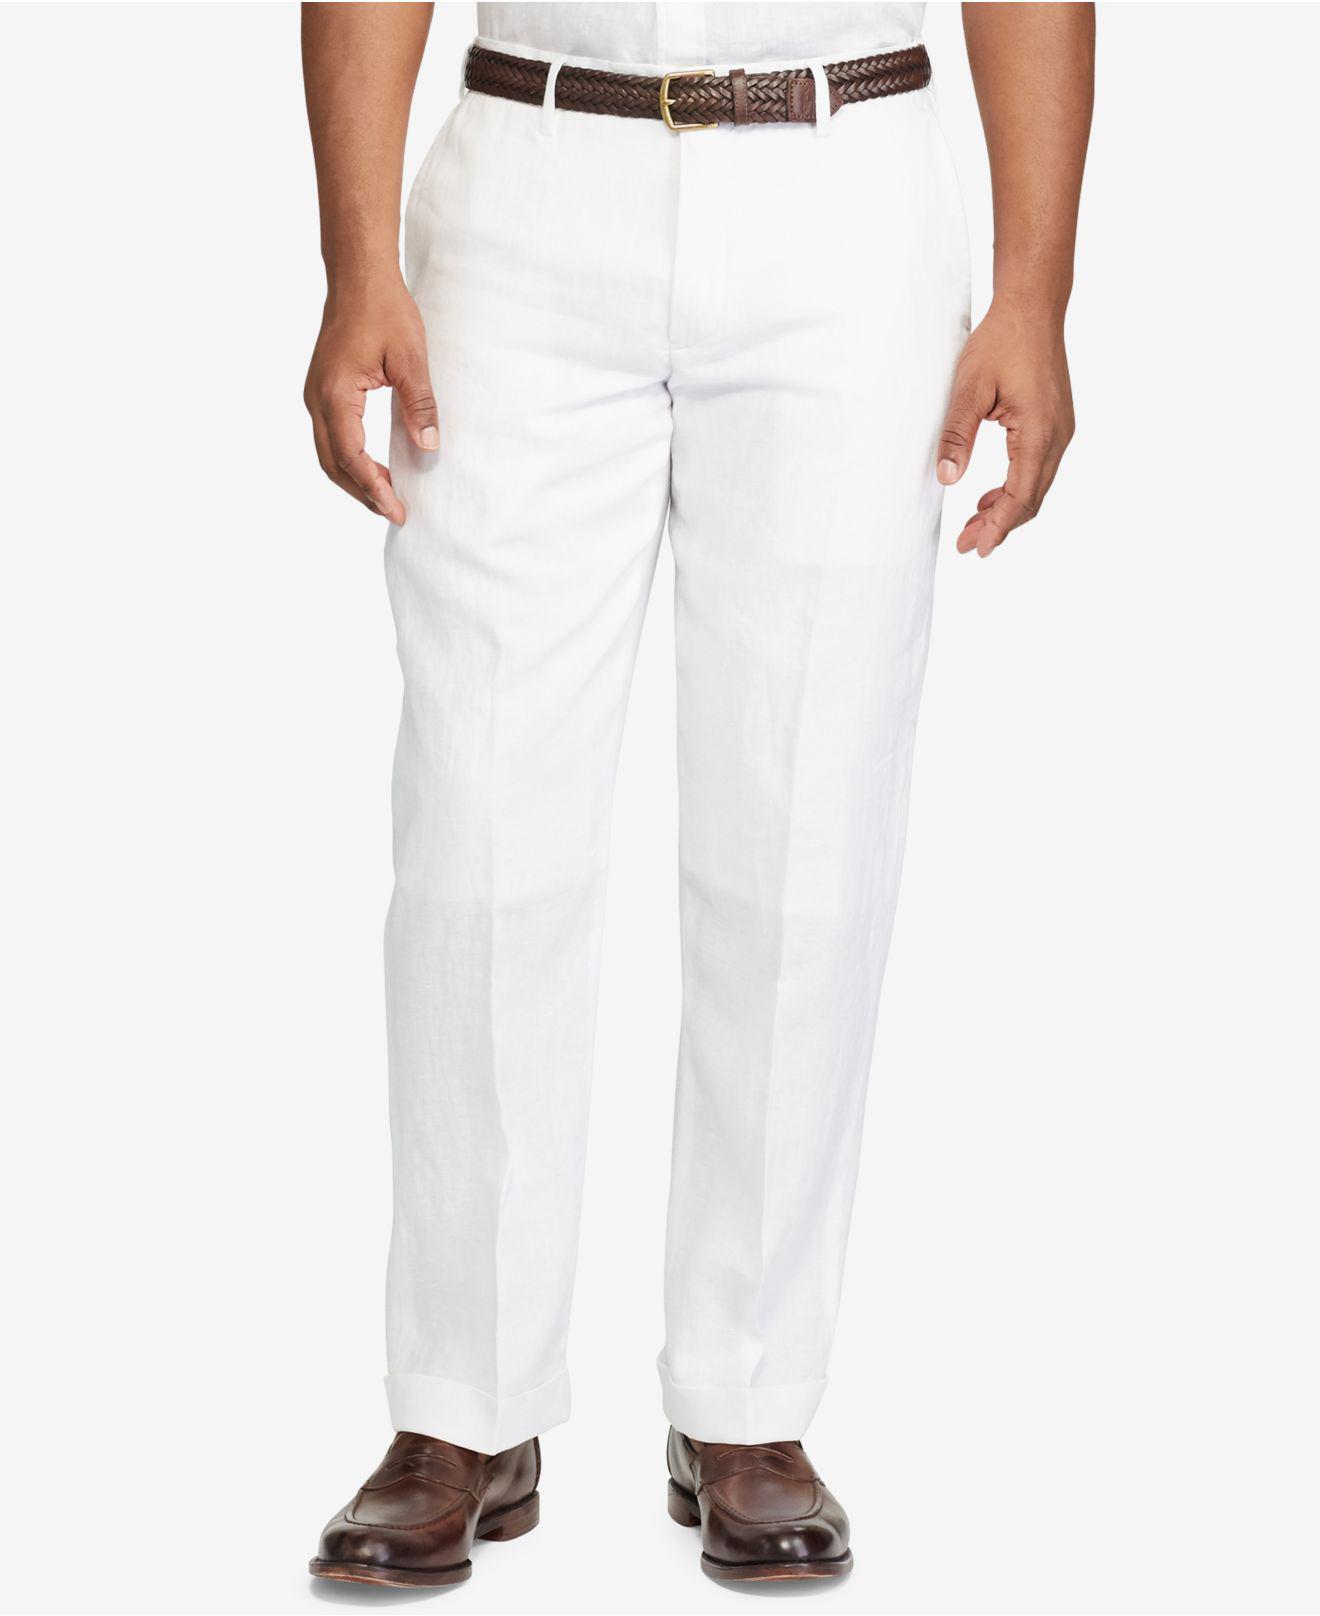 2c09f156f Lyst - Polo Ralph Lauren Men s Classic-fit Linen Pants in White for Men